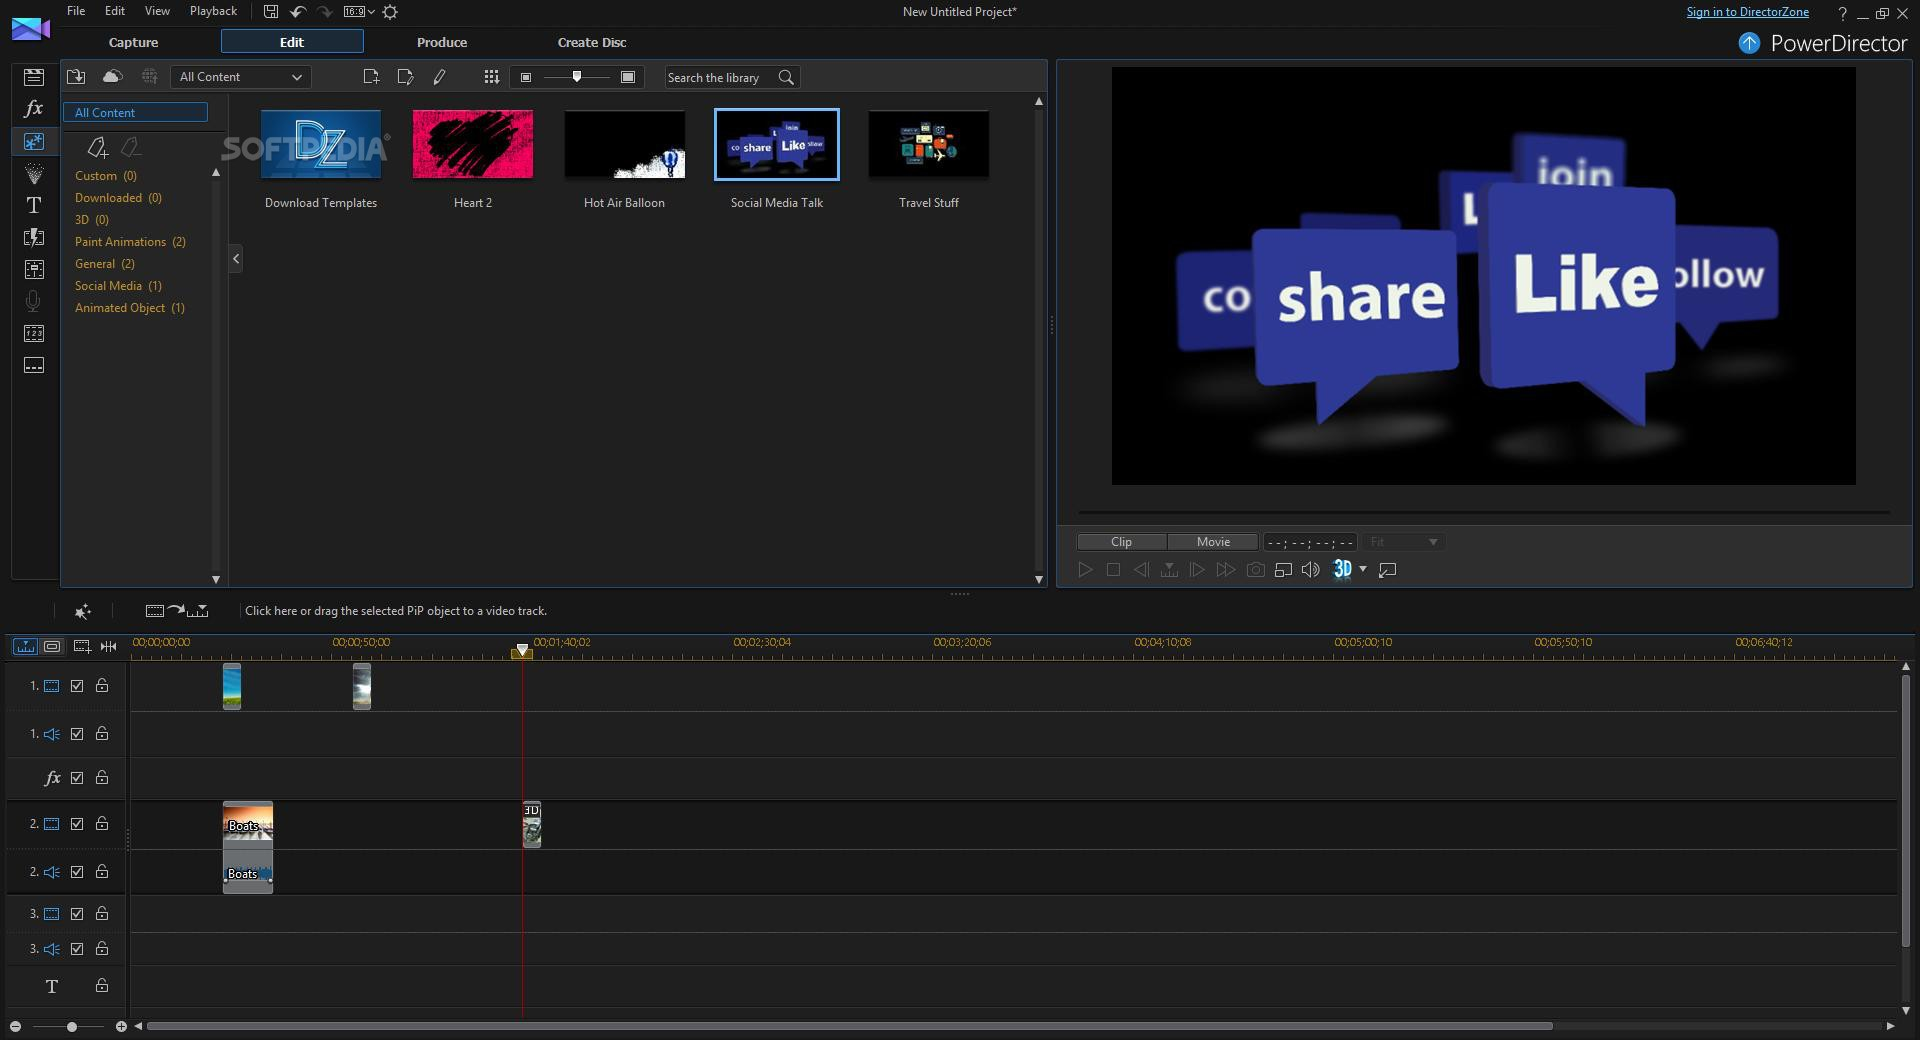 Cyberlink powerdirector 13 review create movies with for Powerdirector slideshow templates download